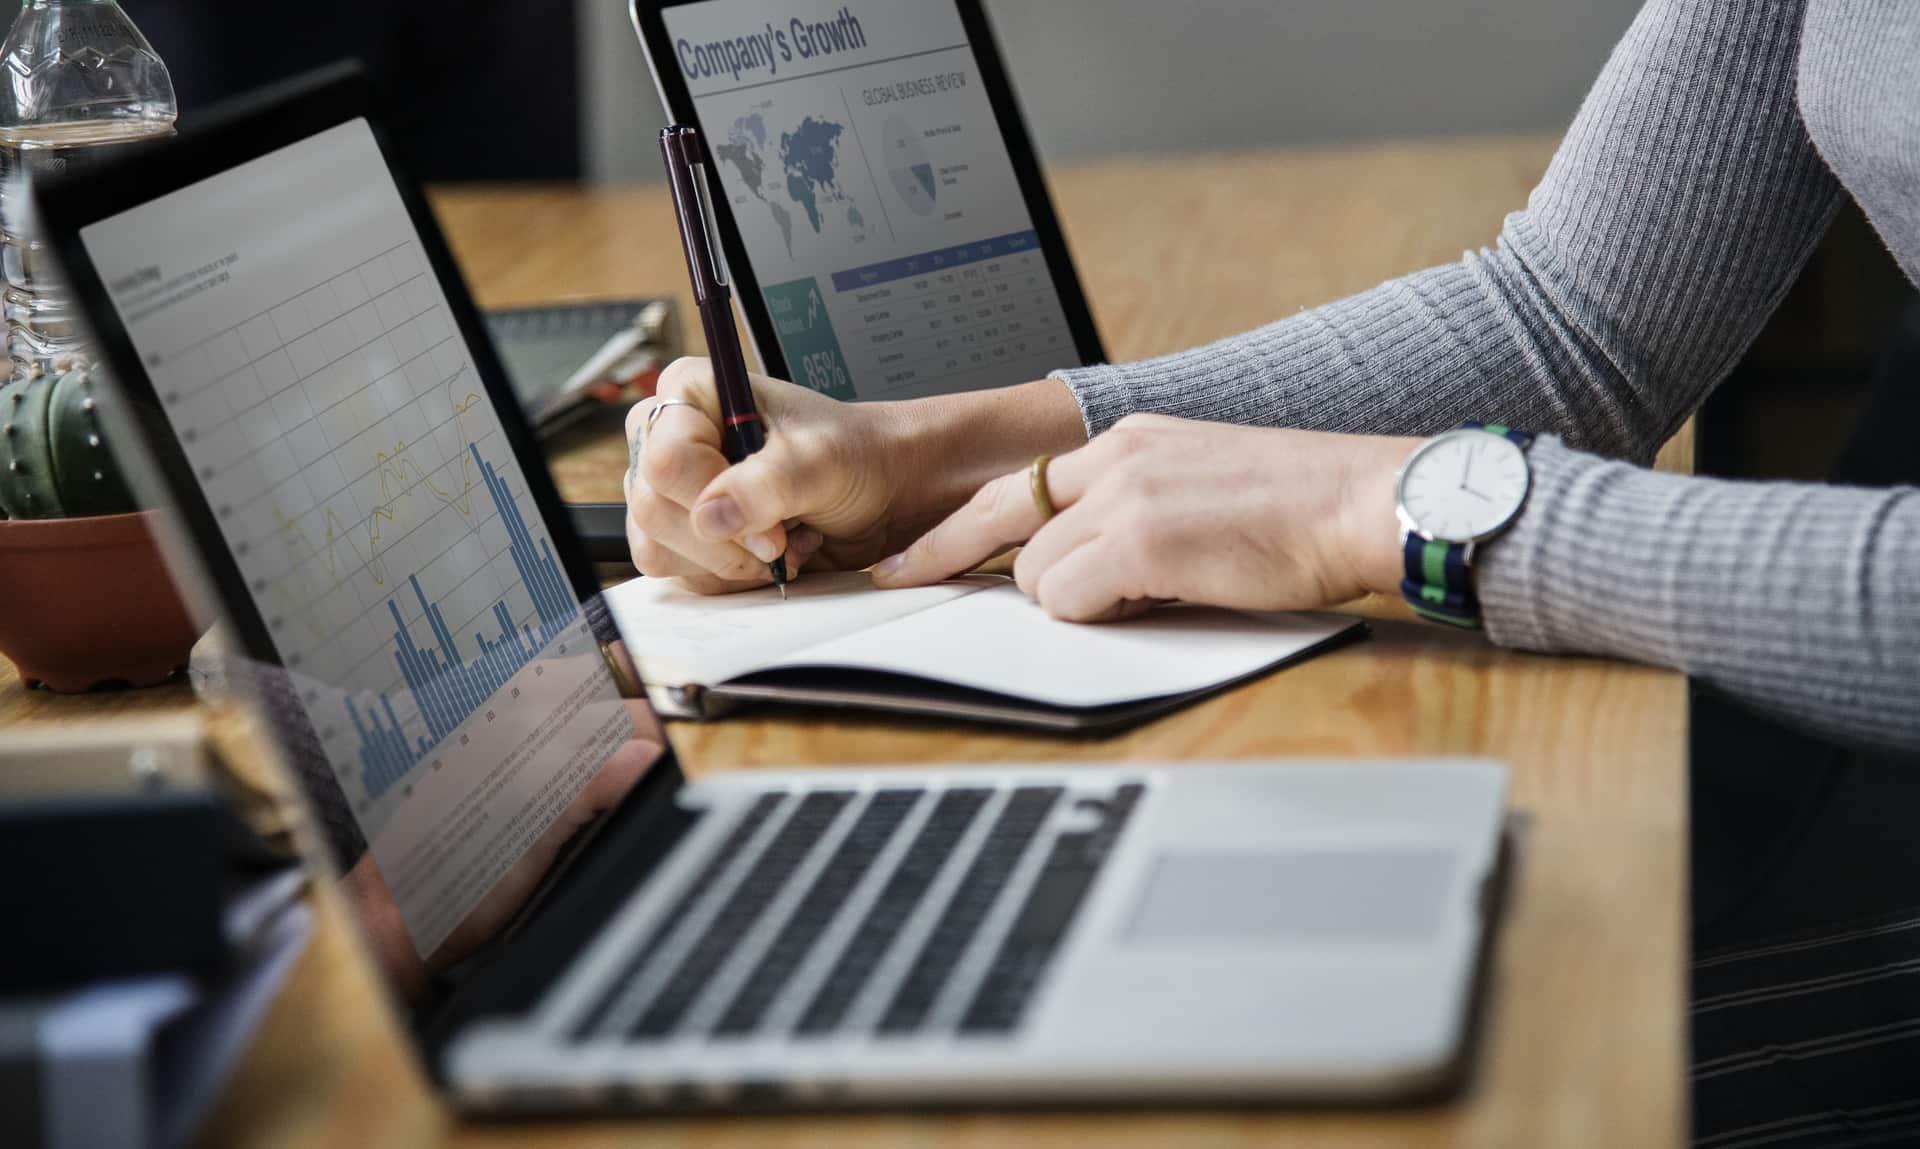 Innovazione analisi dati big data innovation manager Luiss sviluppi digitali futuri